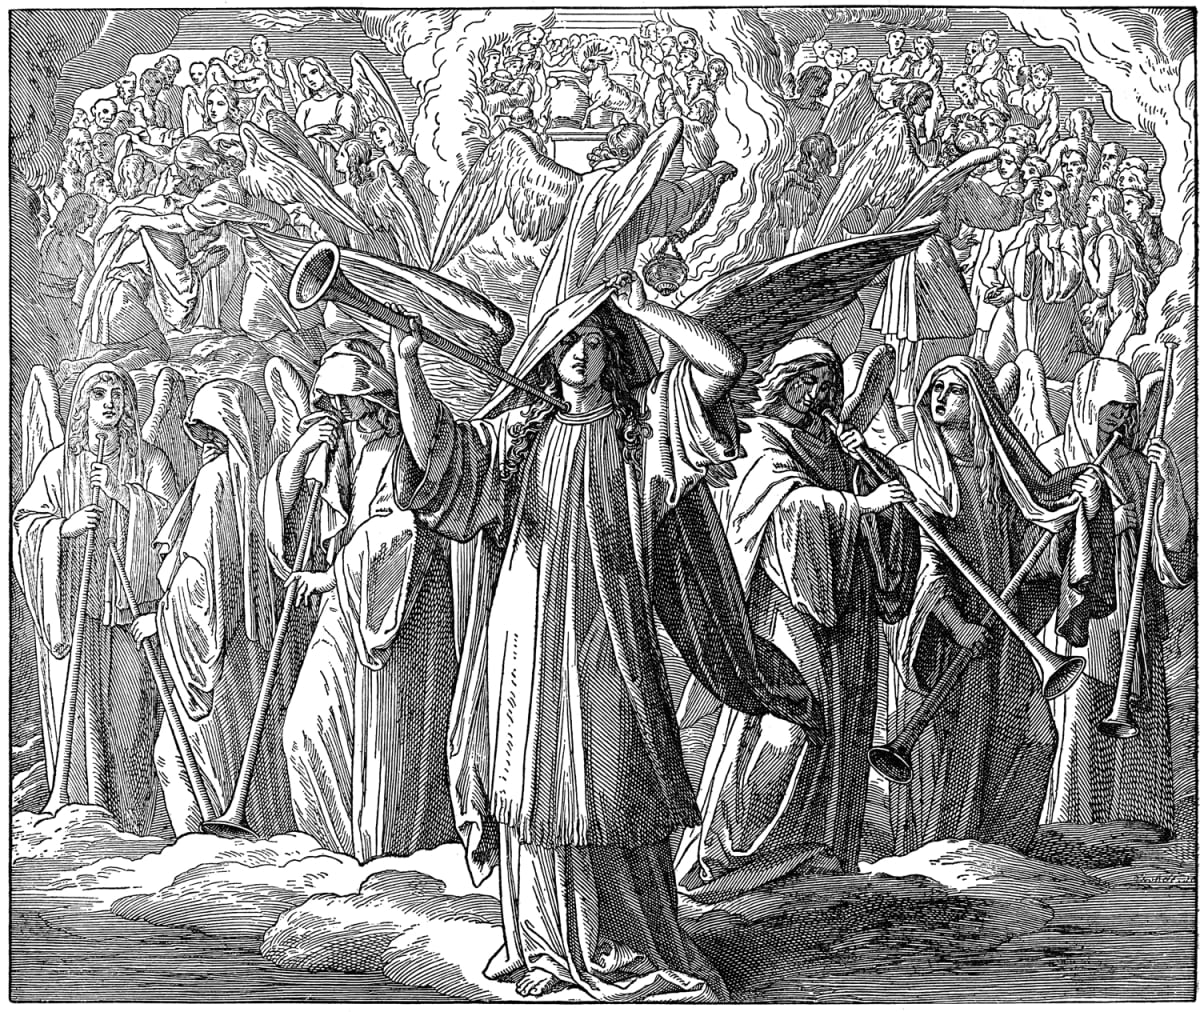 Kuvitus katolisesta kuvaraamatusta Book of Revelation 8,1;2, New Testament, Catholic Picture-Bible The seventh seal of the book, Lamb opening of seven seals